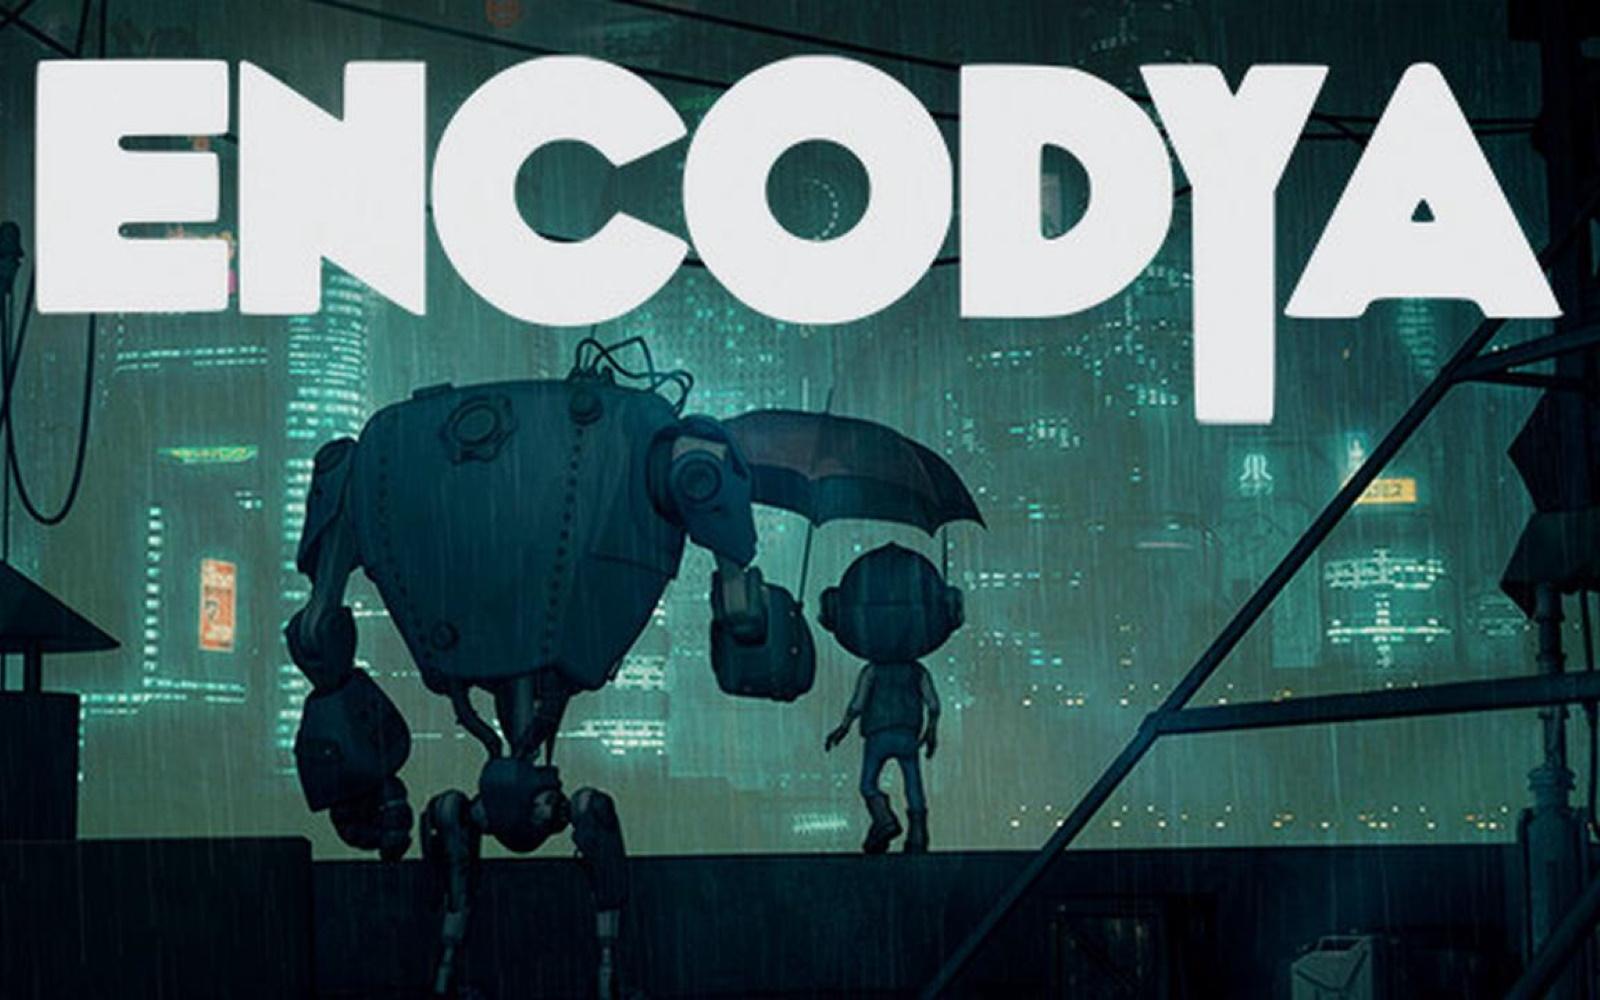 Encodya – Review